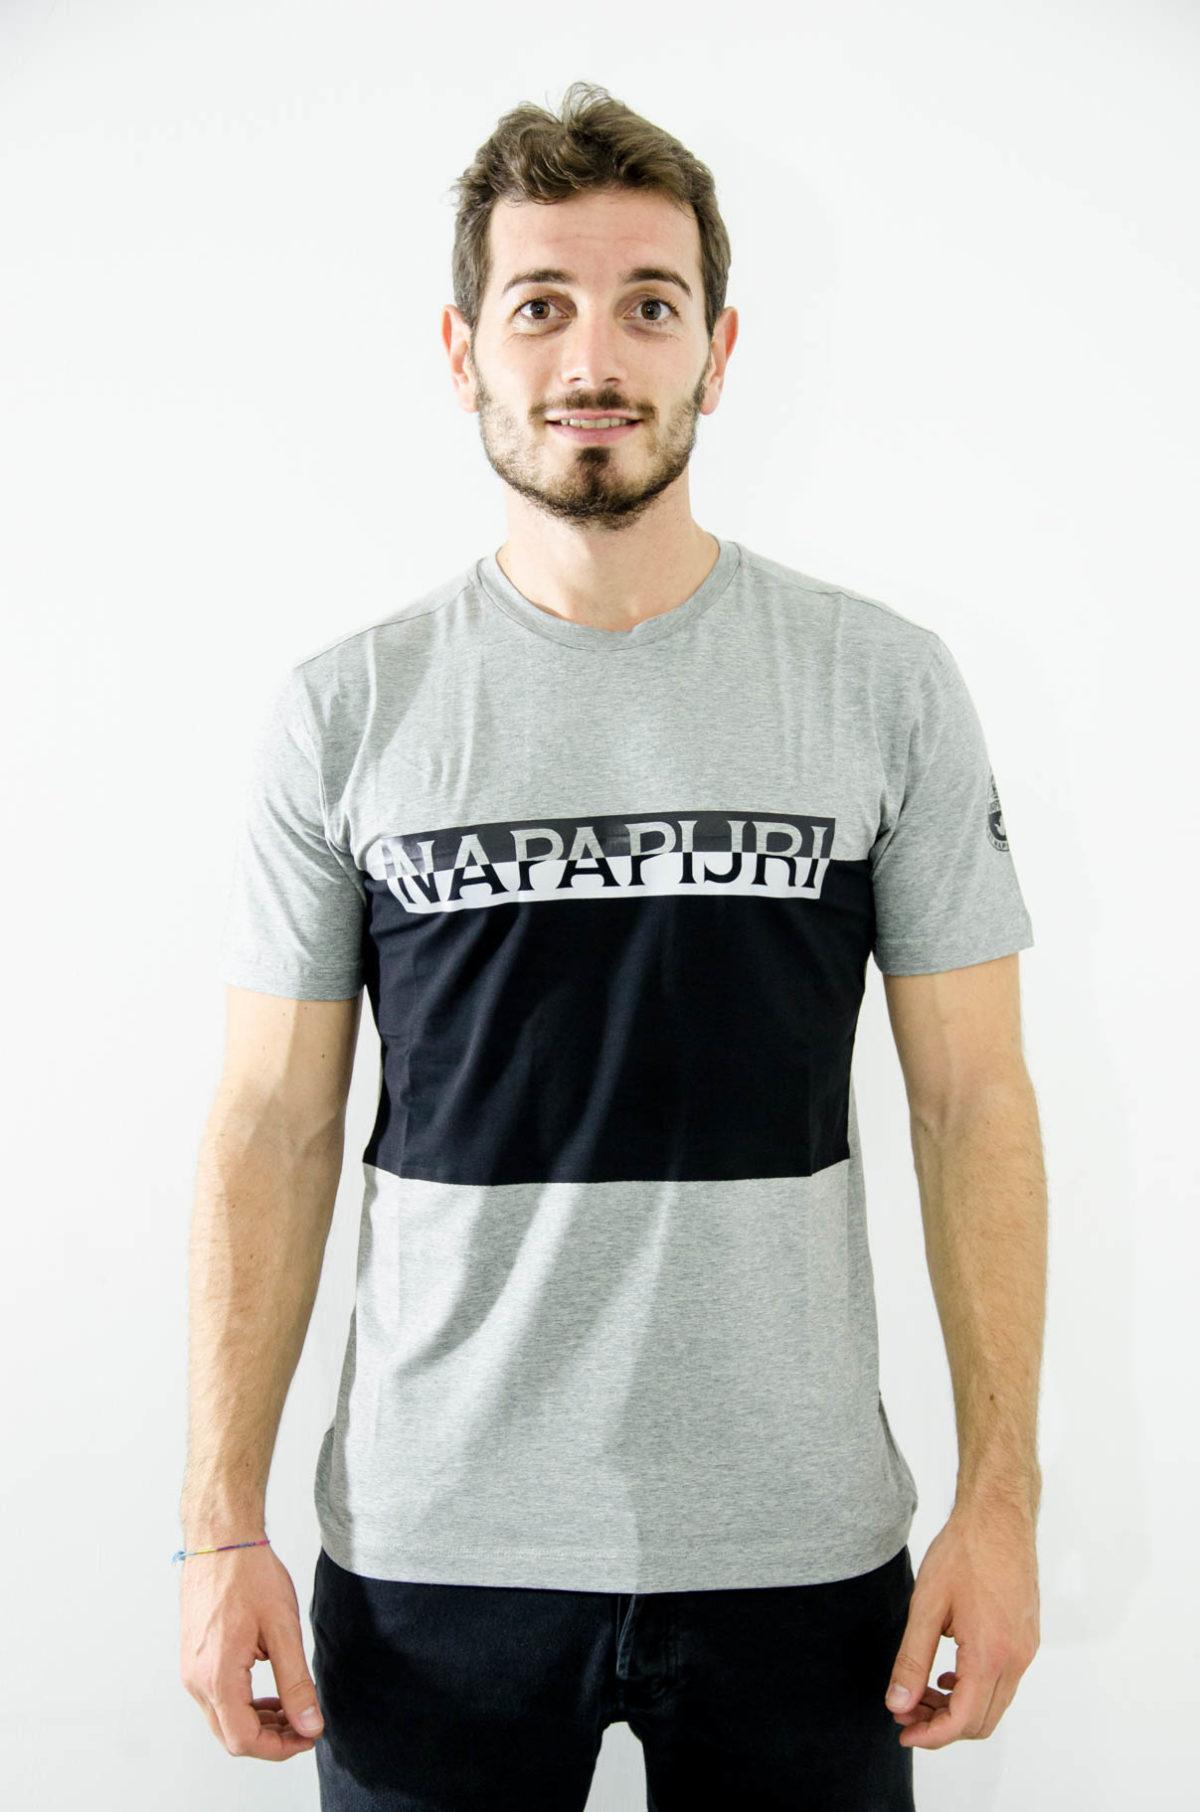 Napapijri T-Shirt Uomo